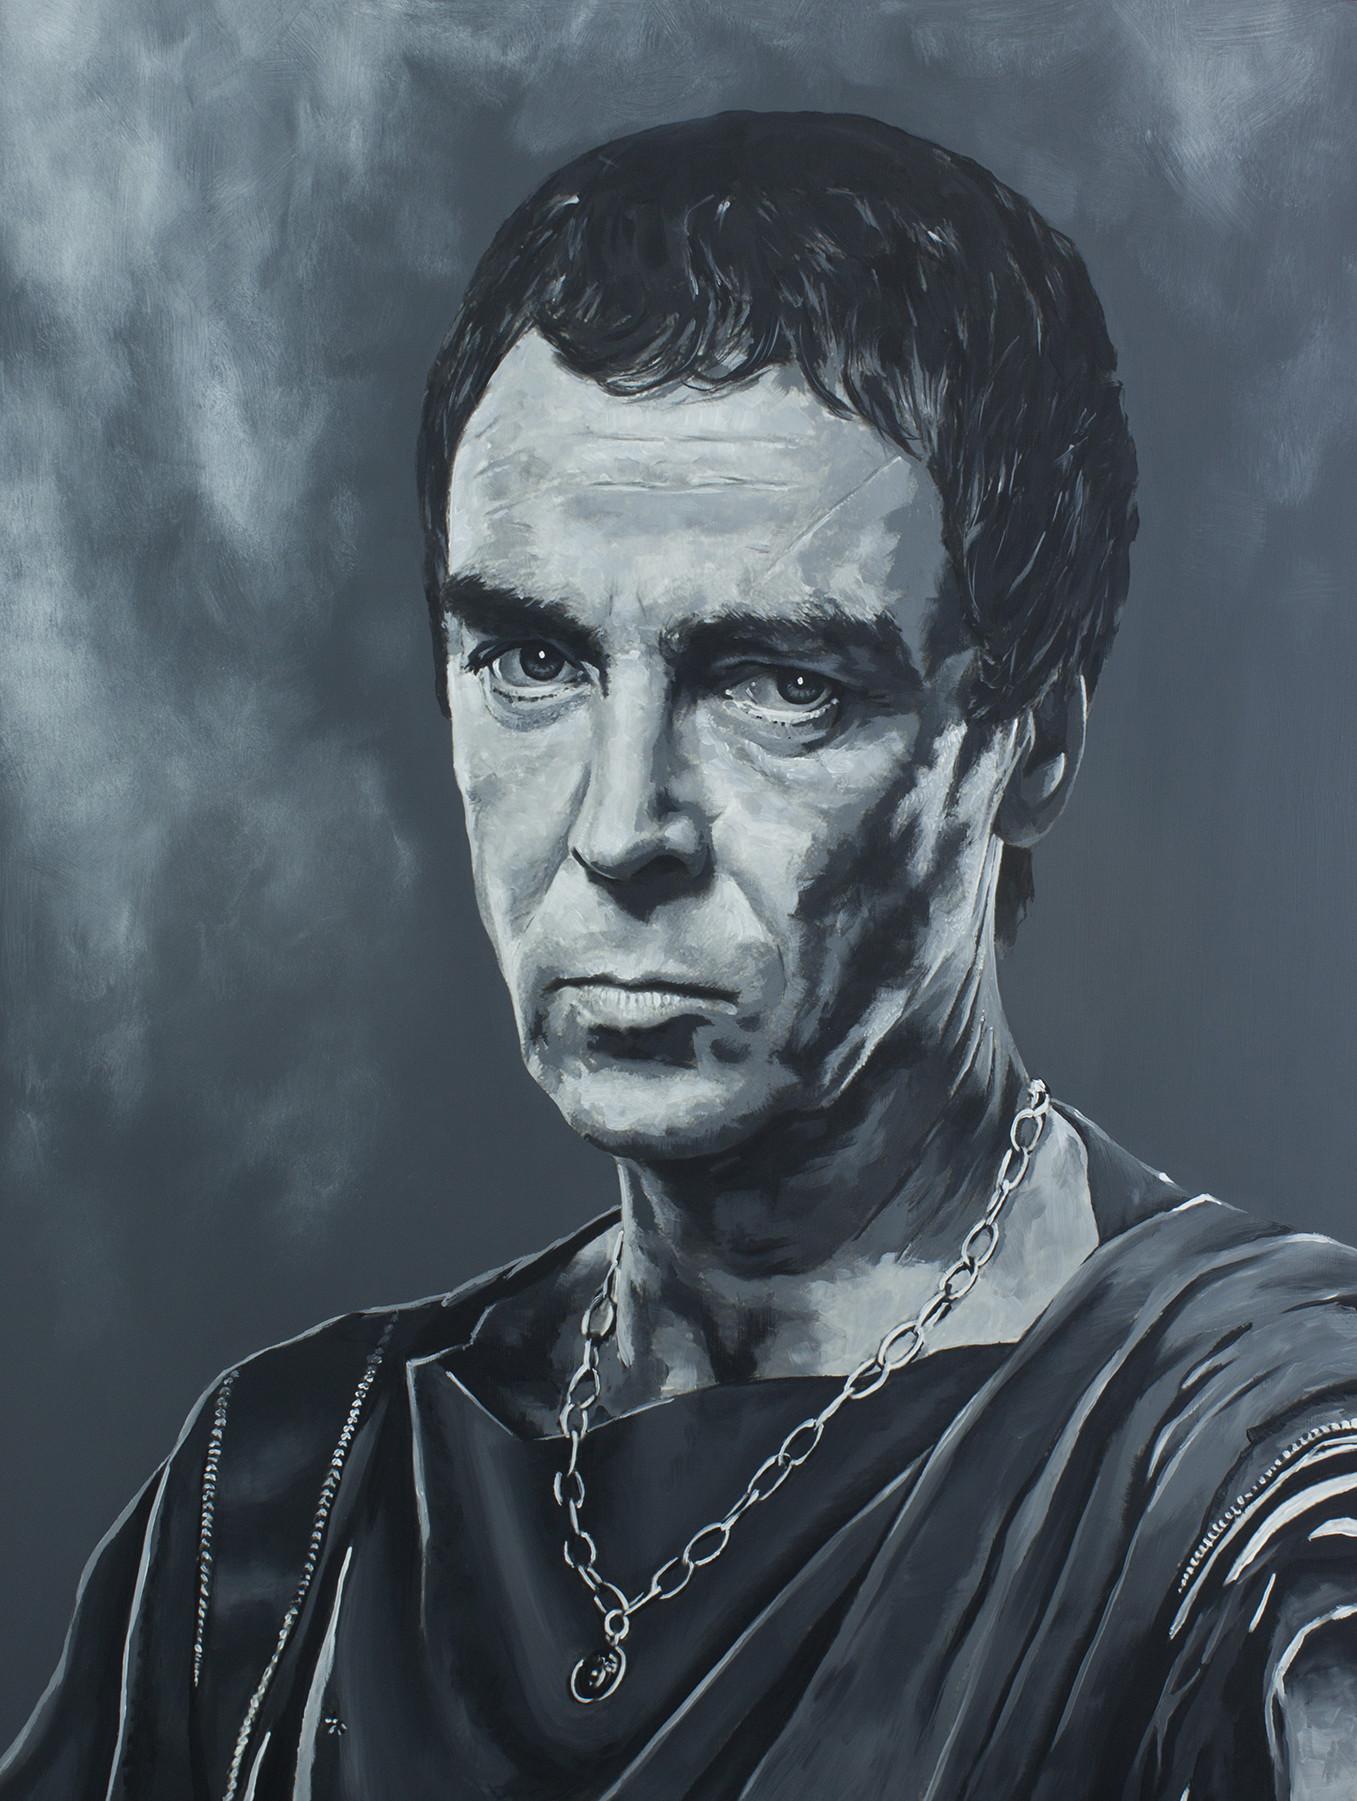 Quintus Lentulus Batiatus - John Hannah Spartacus Series - Acrylic on board. 16x20